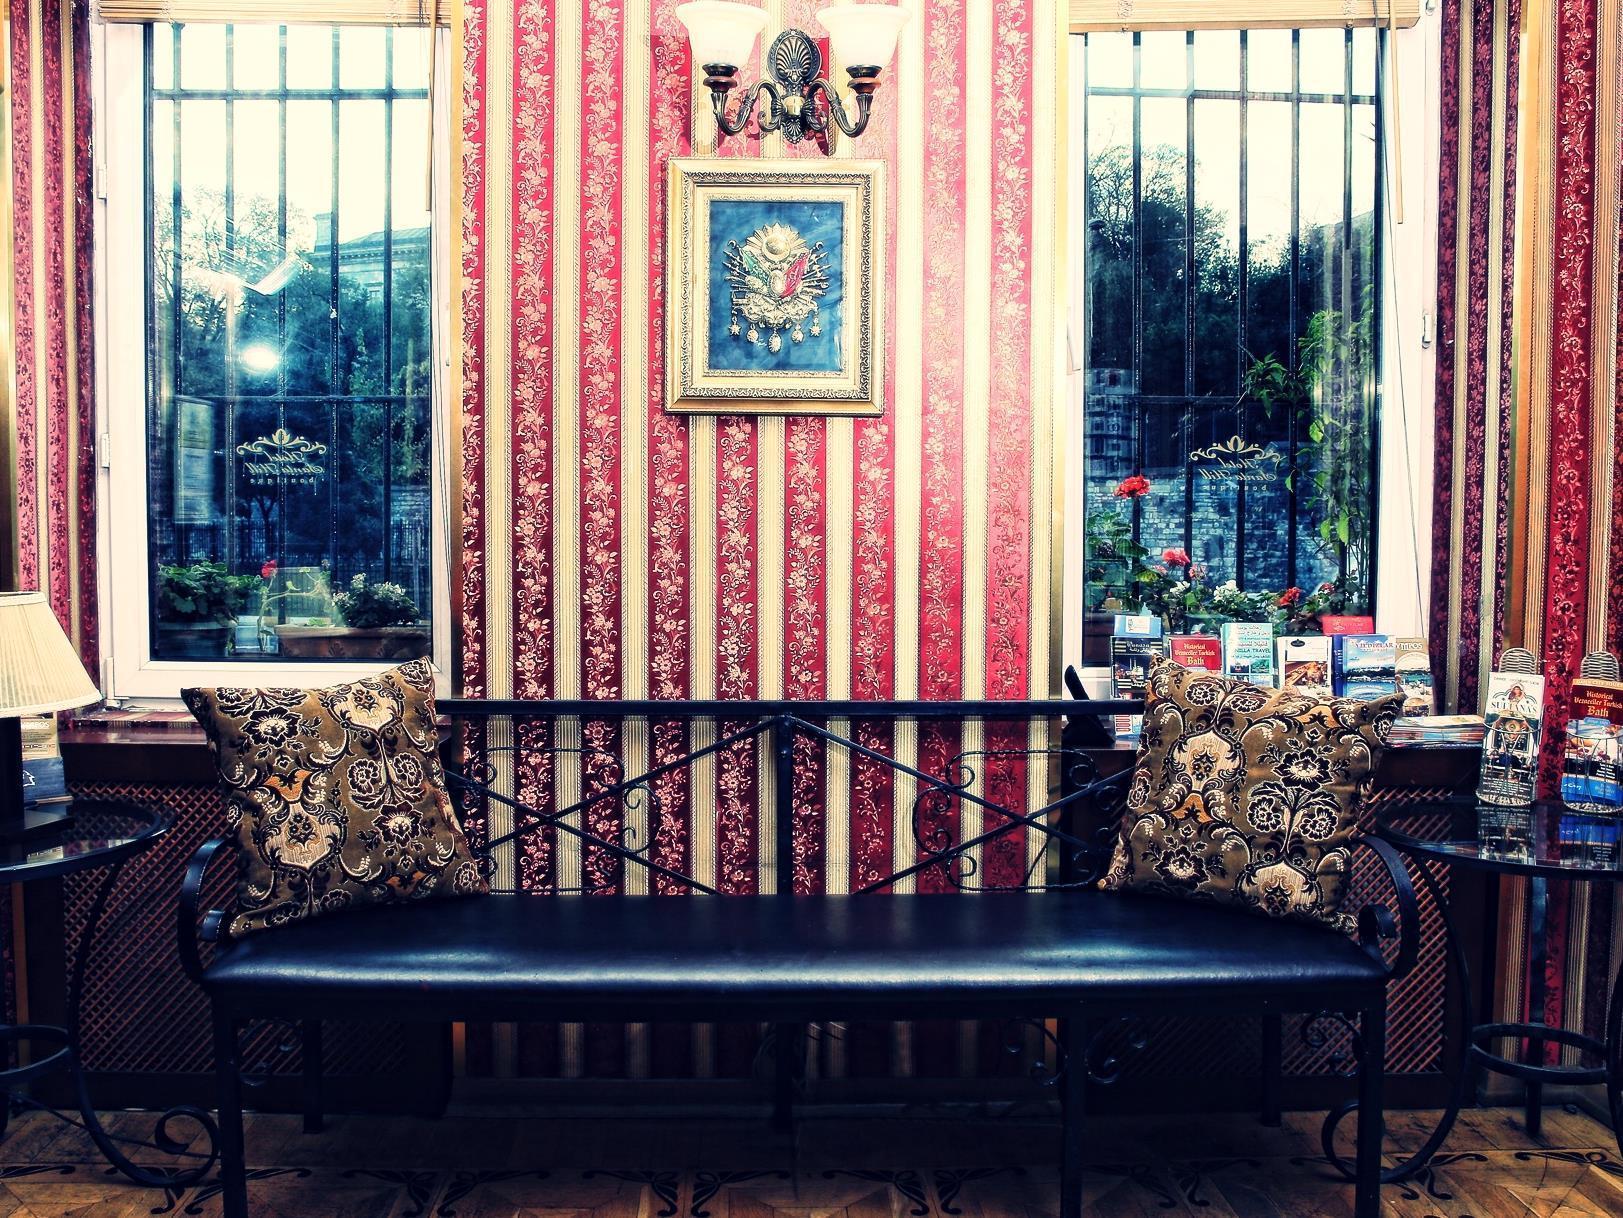 Best Price On Santa Hill Hotel In Istanbul Reviews # Muebles Bazar Santa Sofia